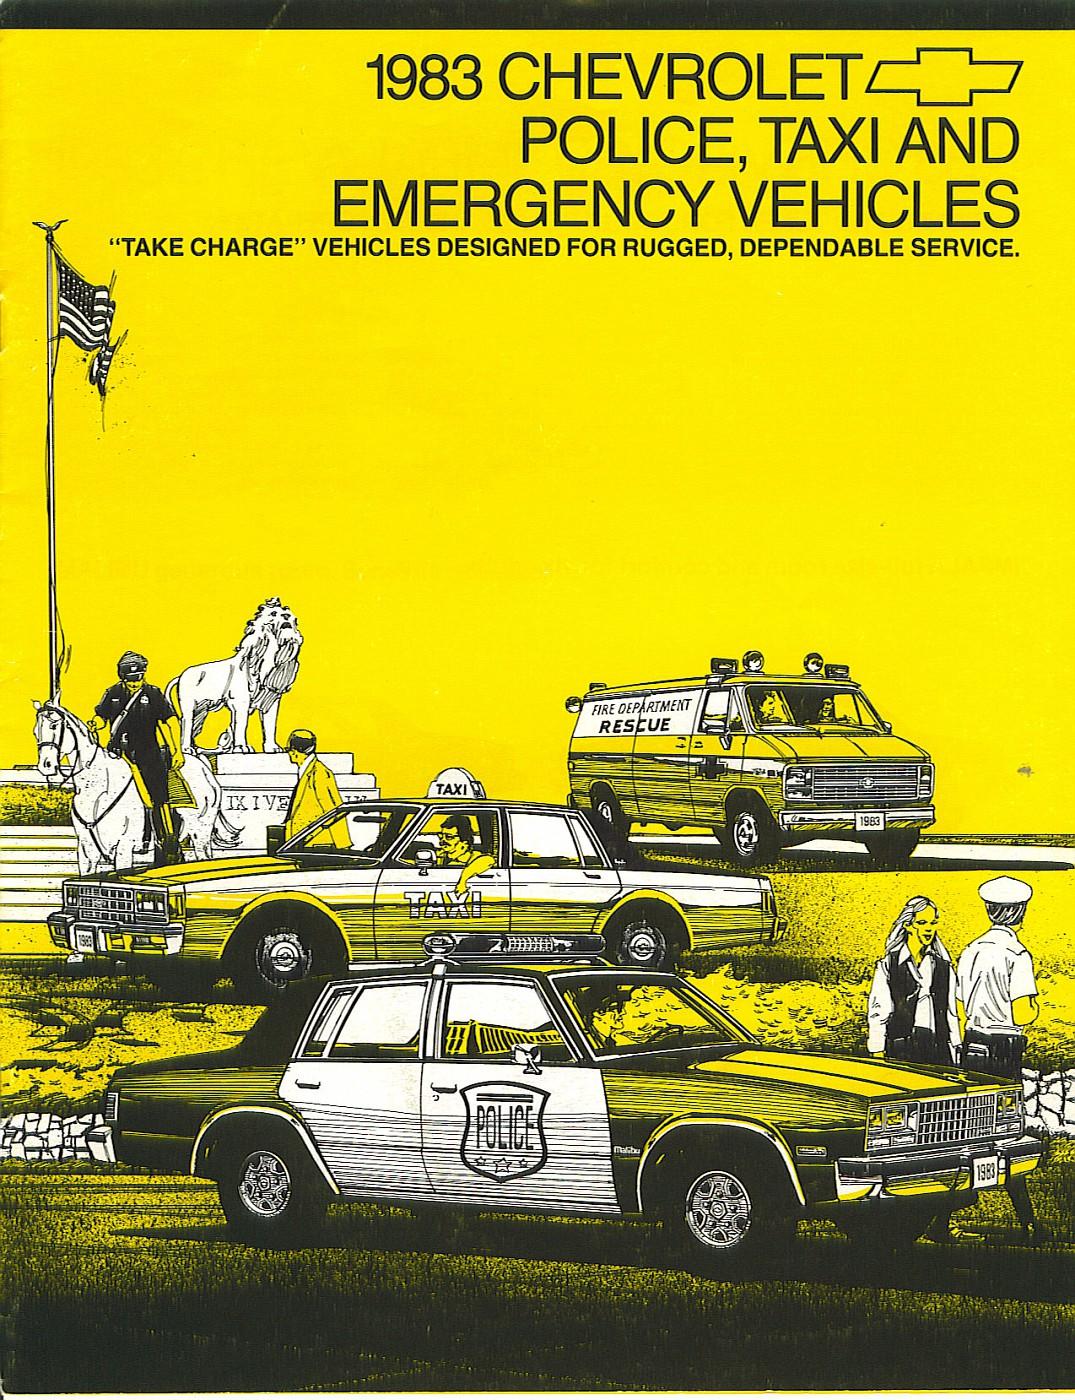 1983Chevrolet01-vi.jpg